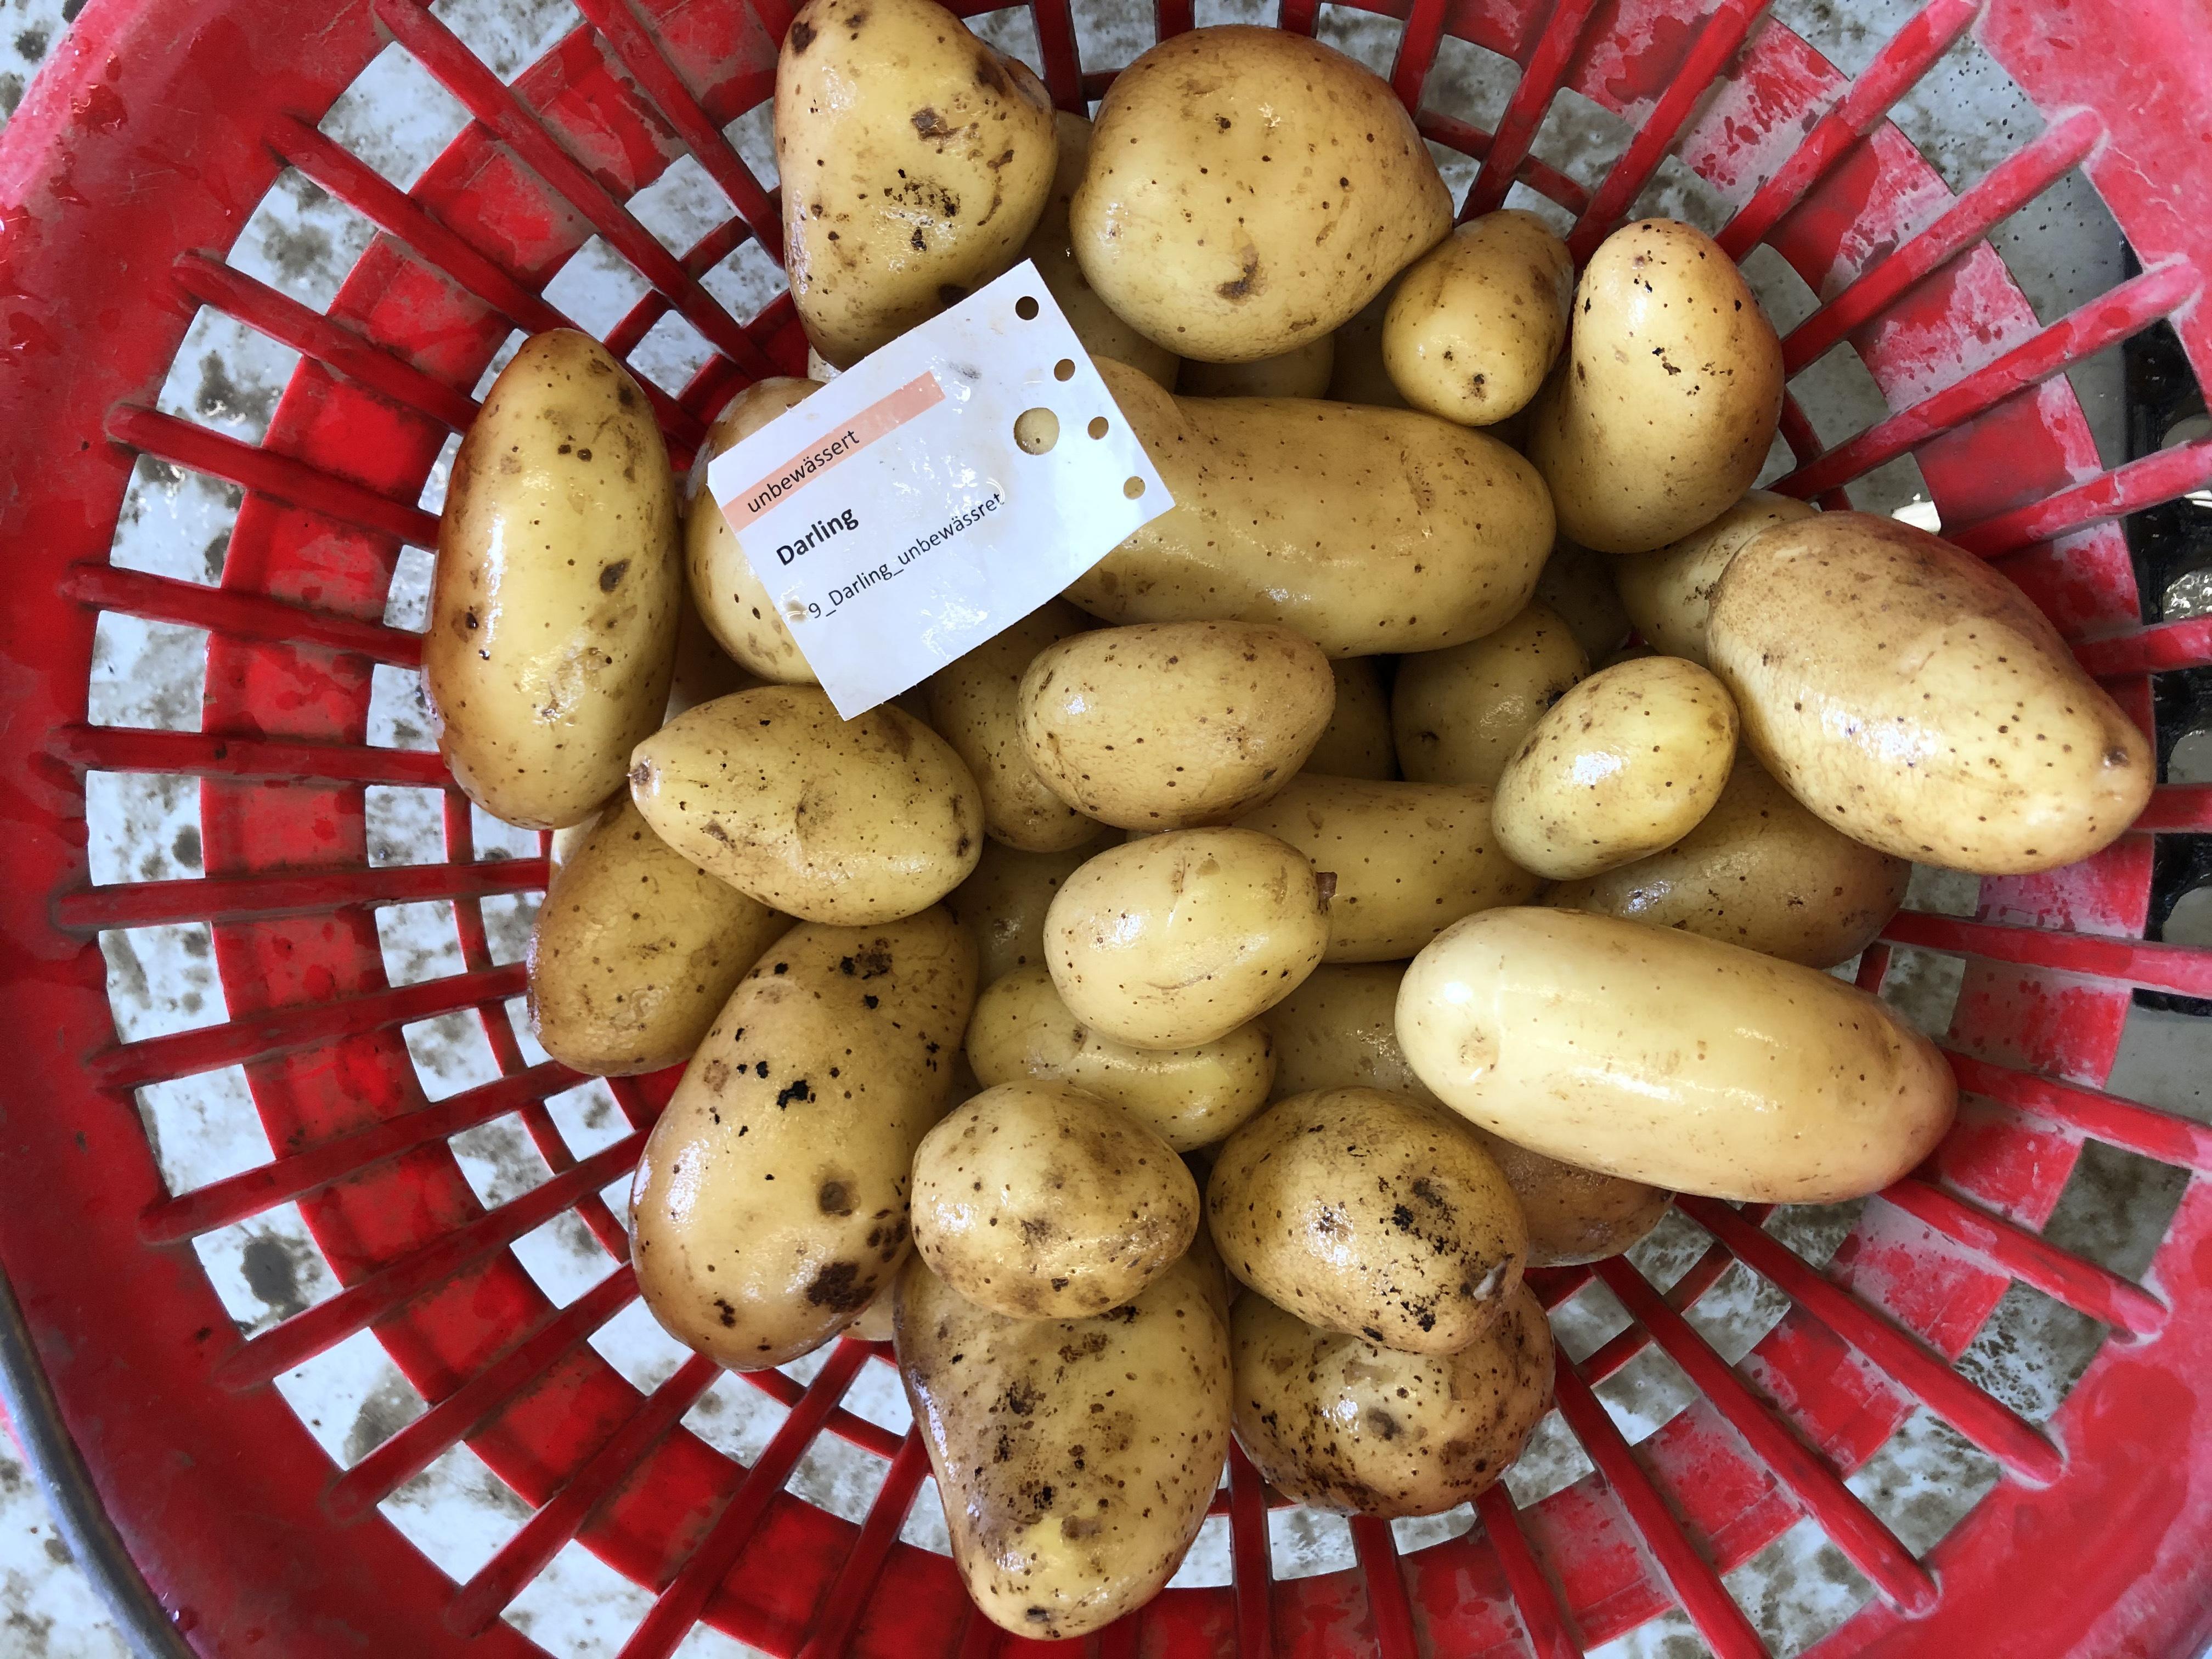 Waschprobe Sorte Darling Kartoffel Sortenversuch Humlikon 2020